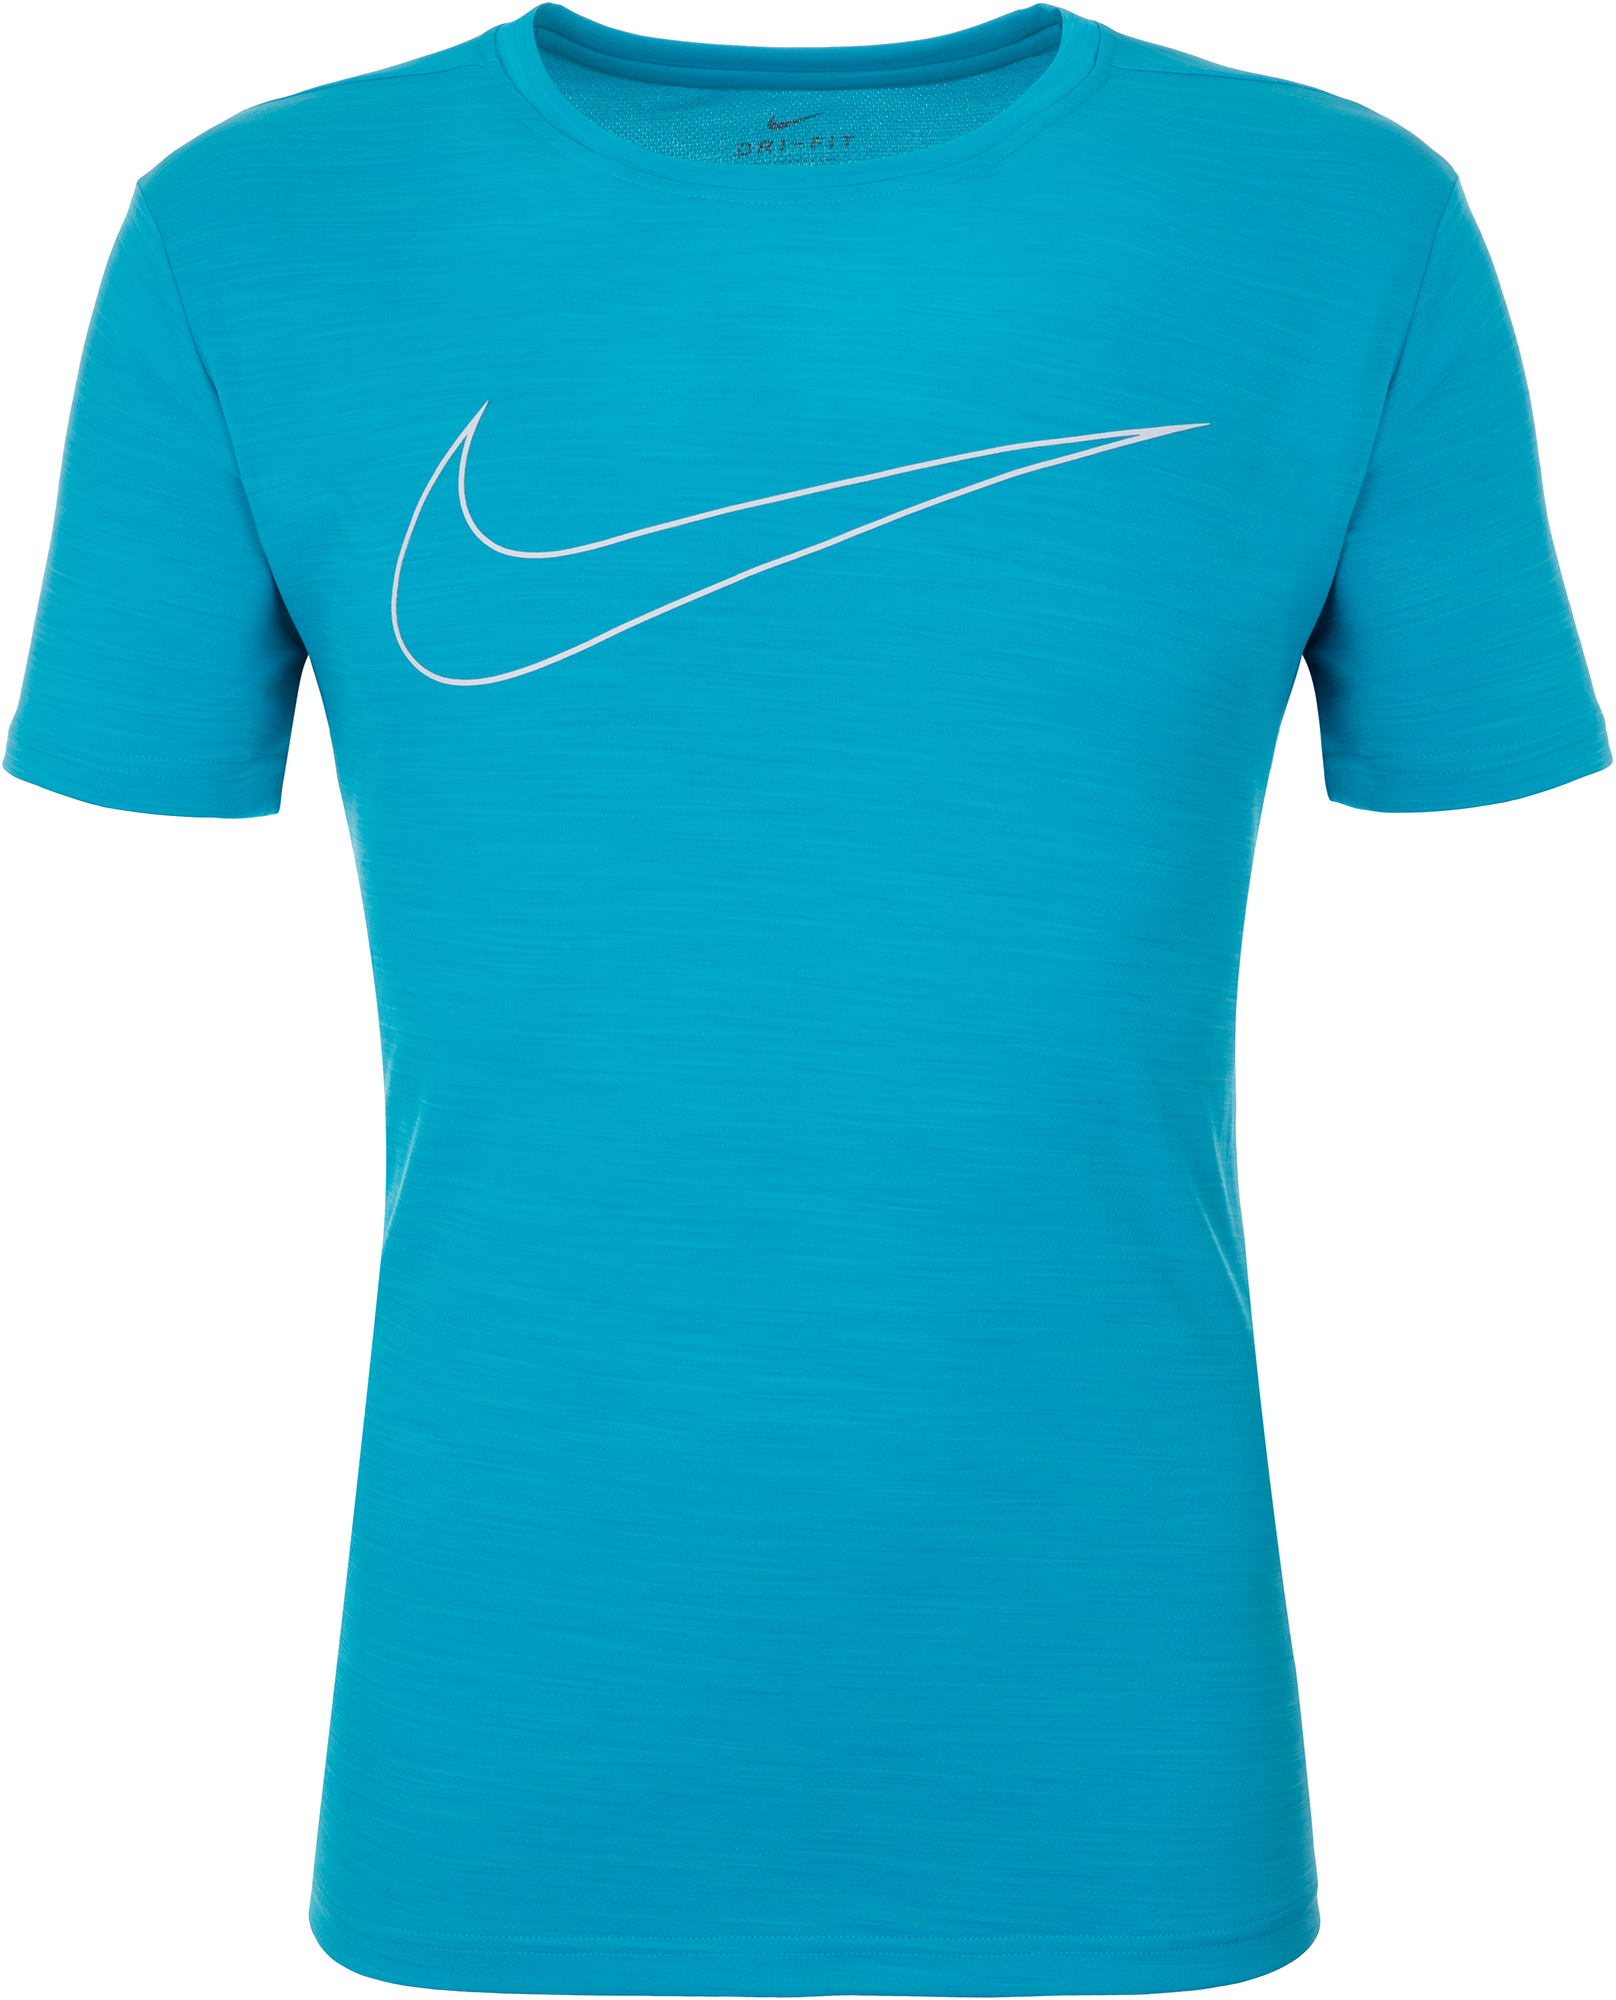 Фото Nike Футболка мужская Nike Superset, размер 52-54